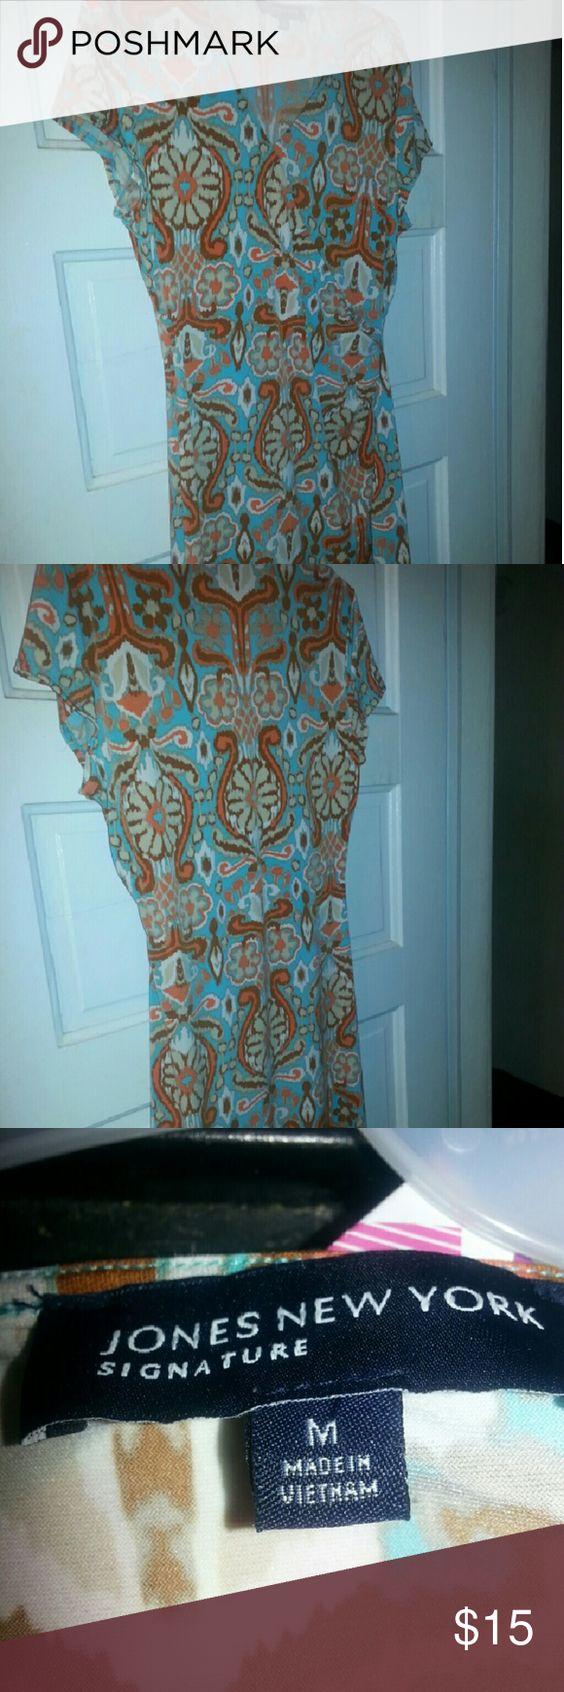 Adorable brown and teal dress Cute fall dress Jones New York Dresses Midi